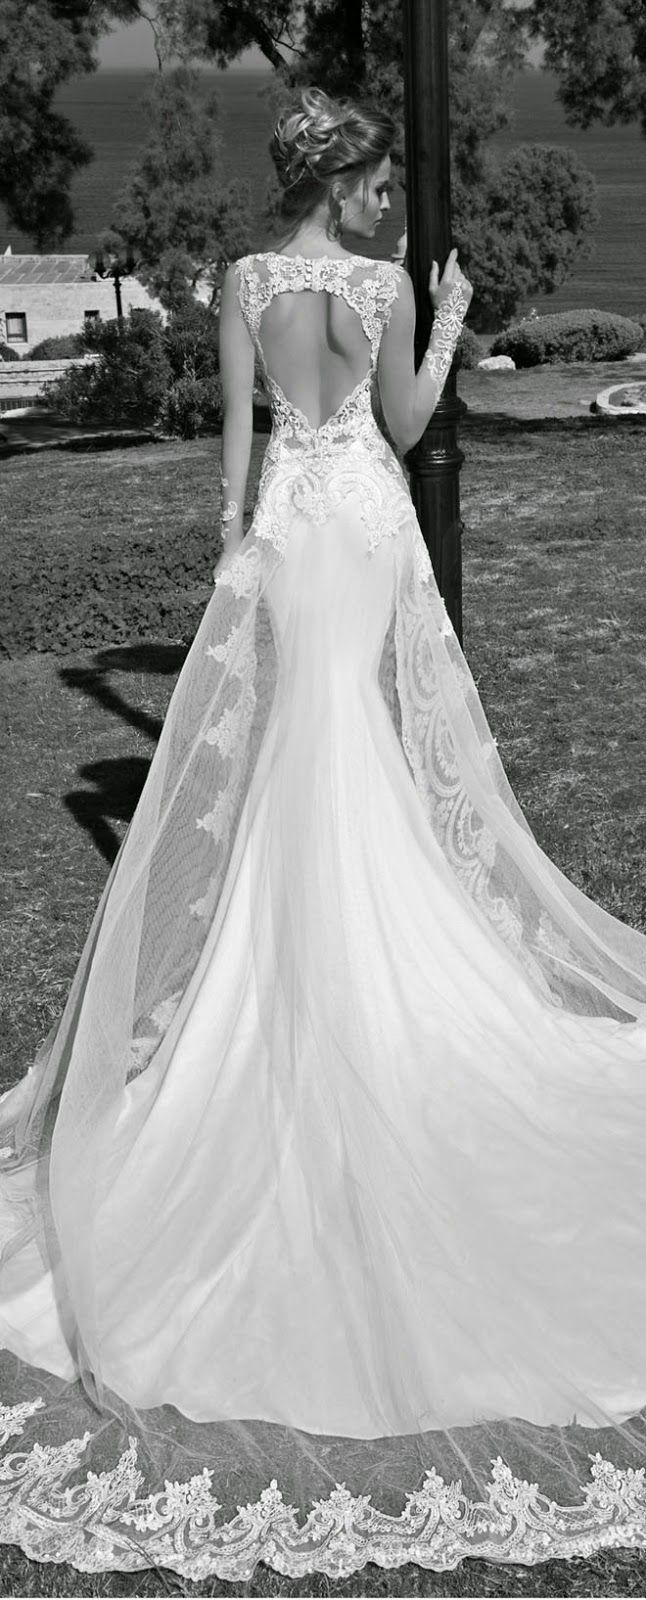 Omg amazing!!!! .....Galia Lahav Spring 2015 : La Dolce Vita Bridal Collection - Belle the Magazine . The Wedding Blog For The Sophisticated Bride